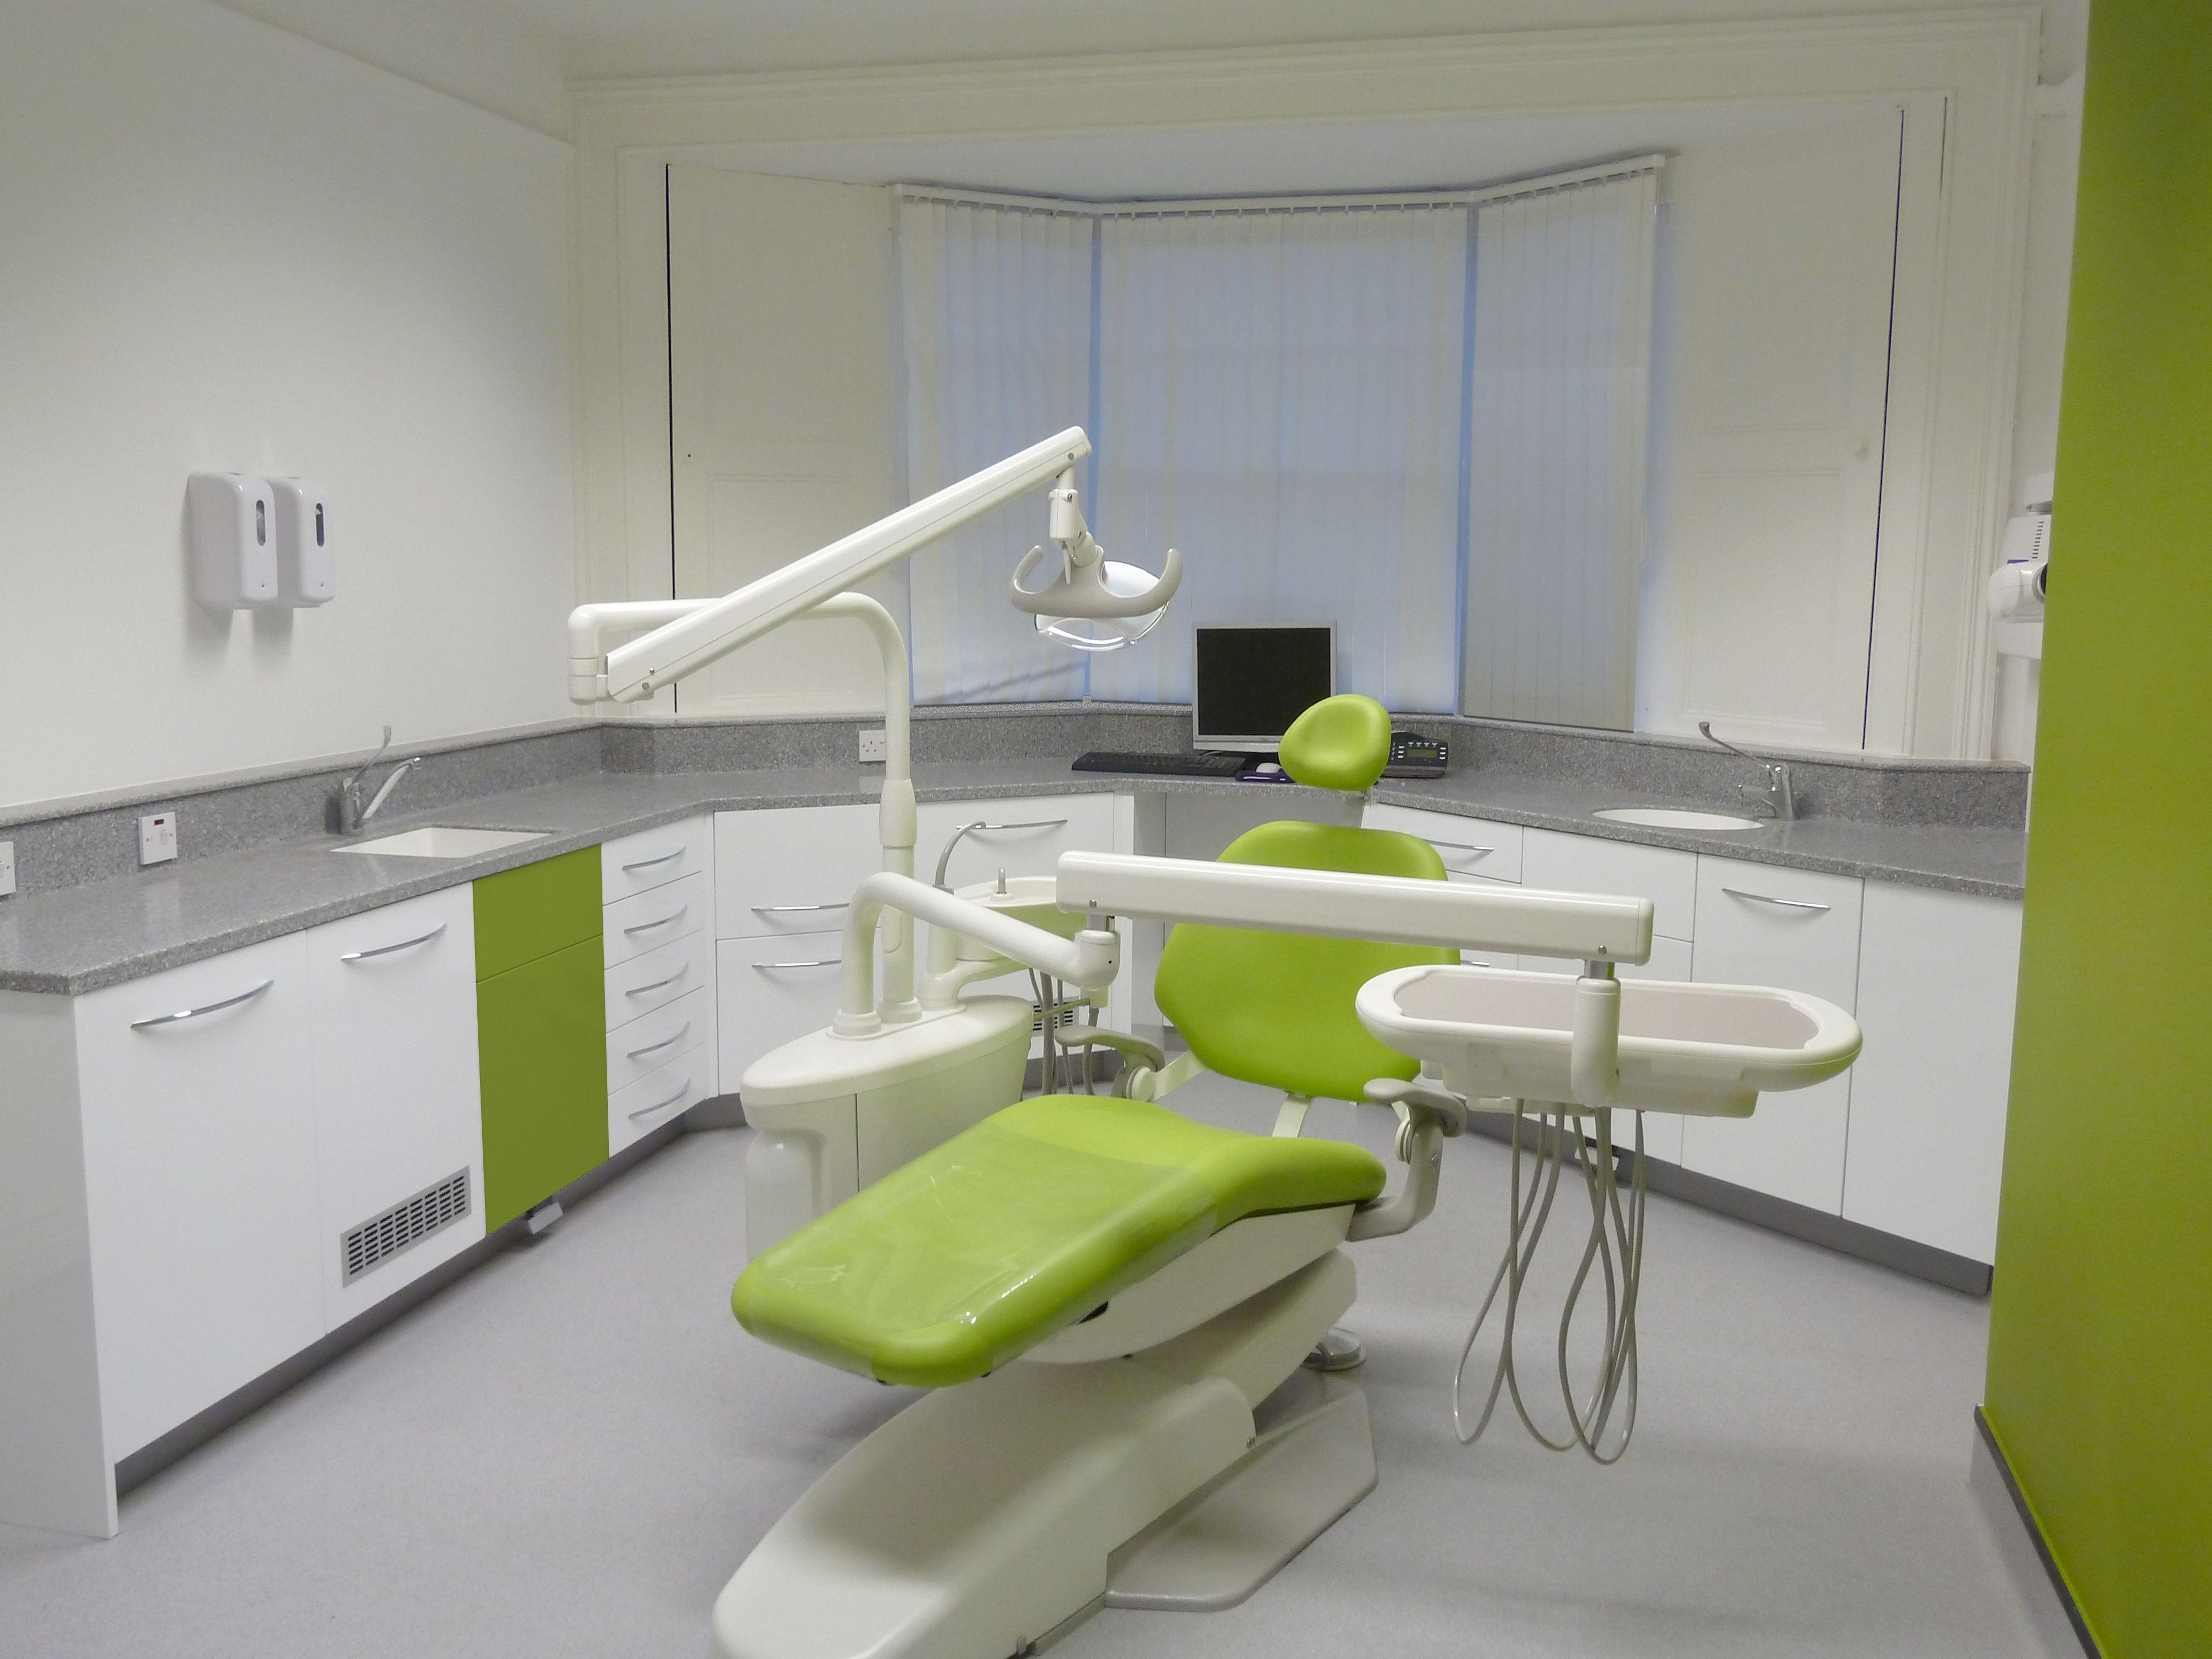 Dental surgery design inspiration Dental office design